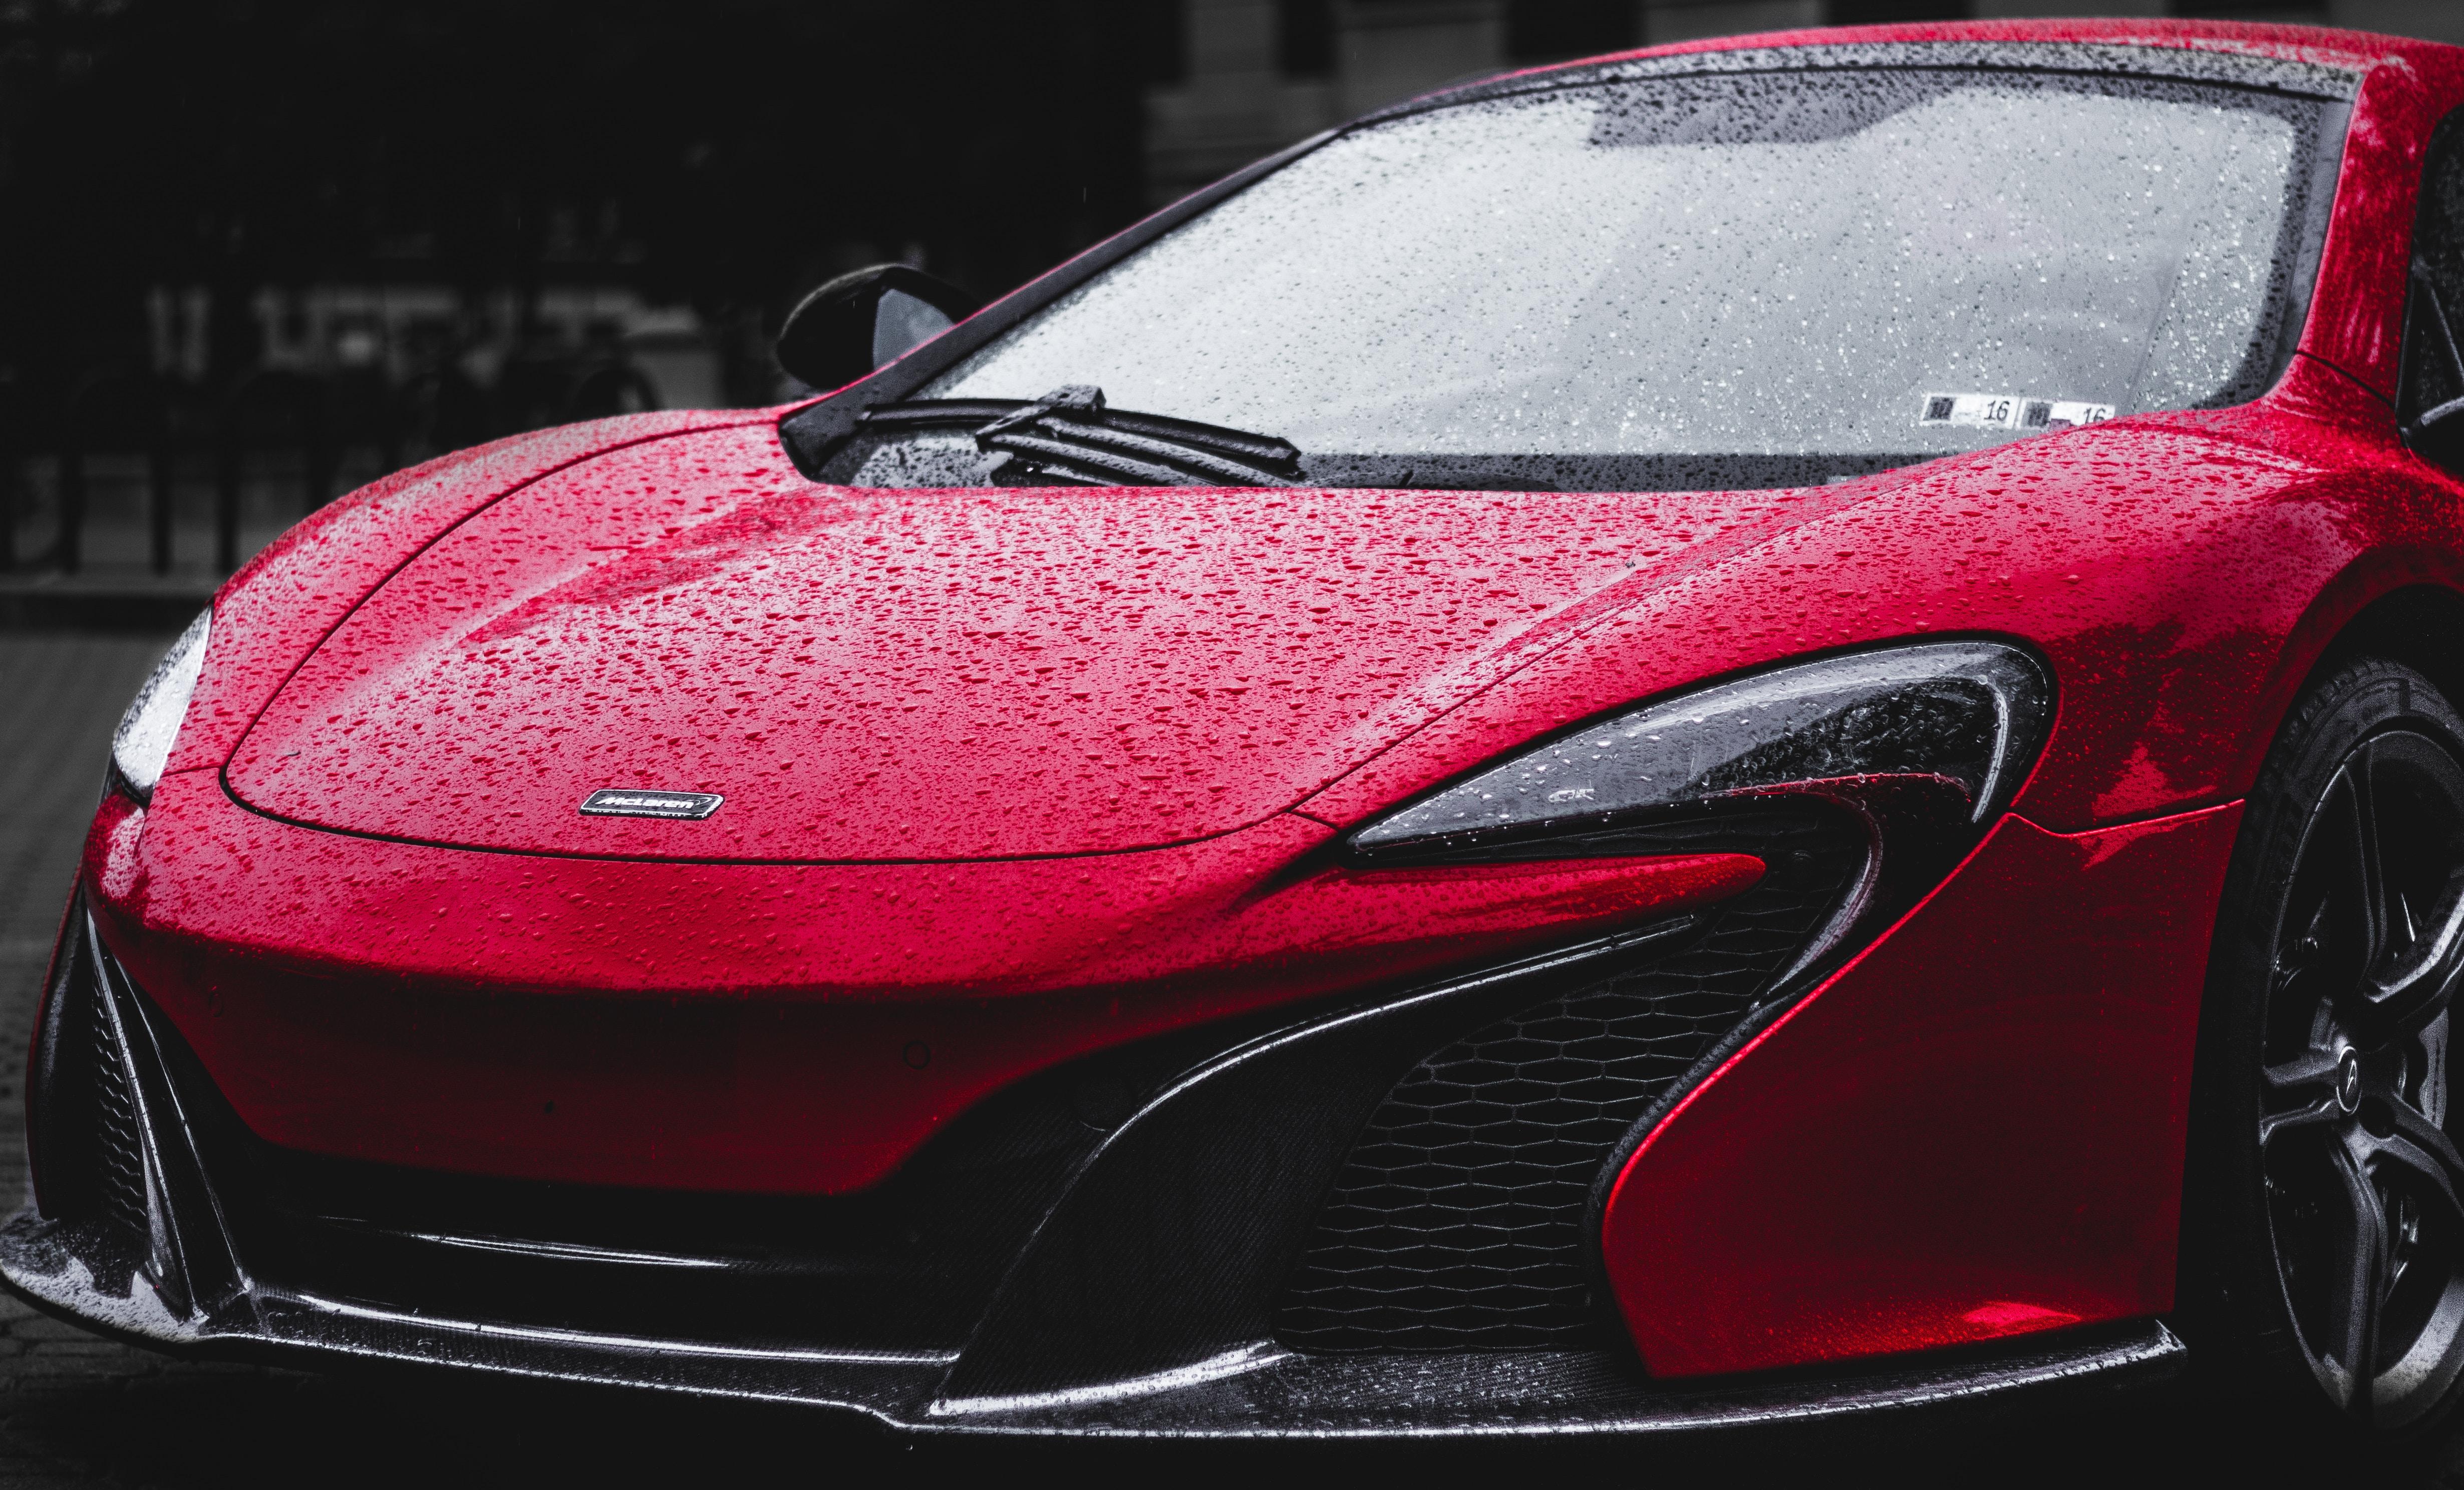 red sports car hood